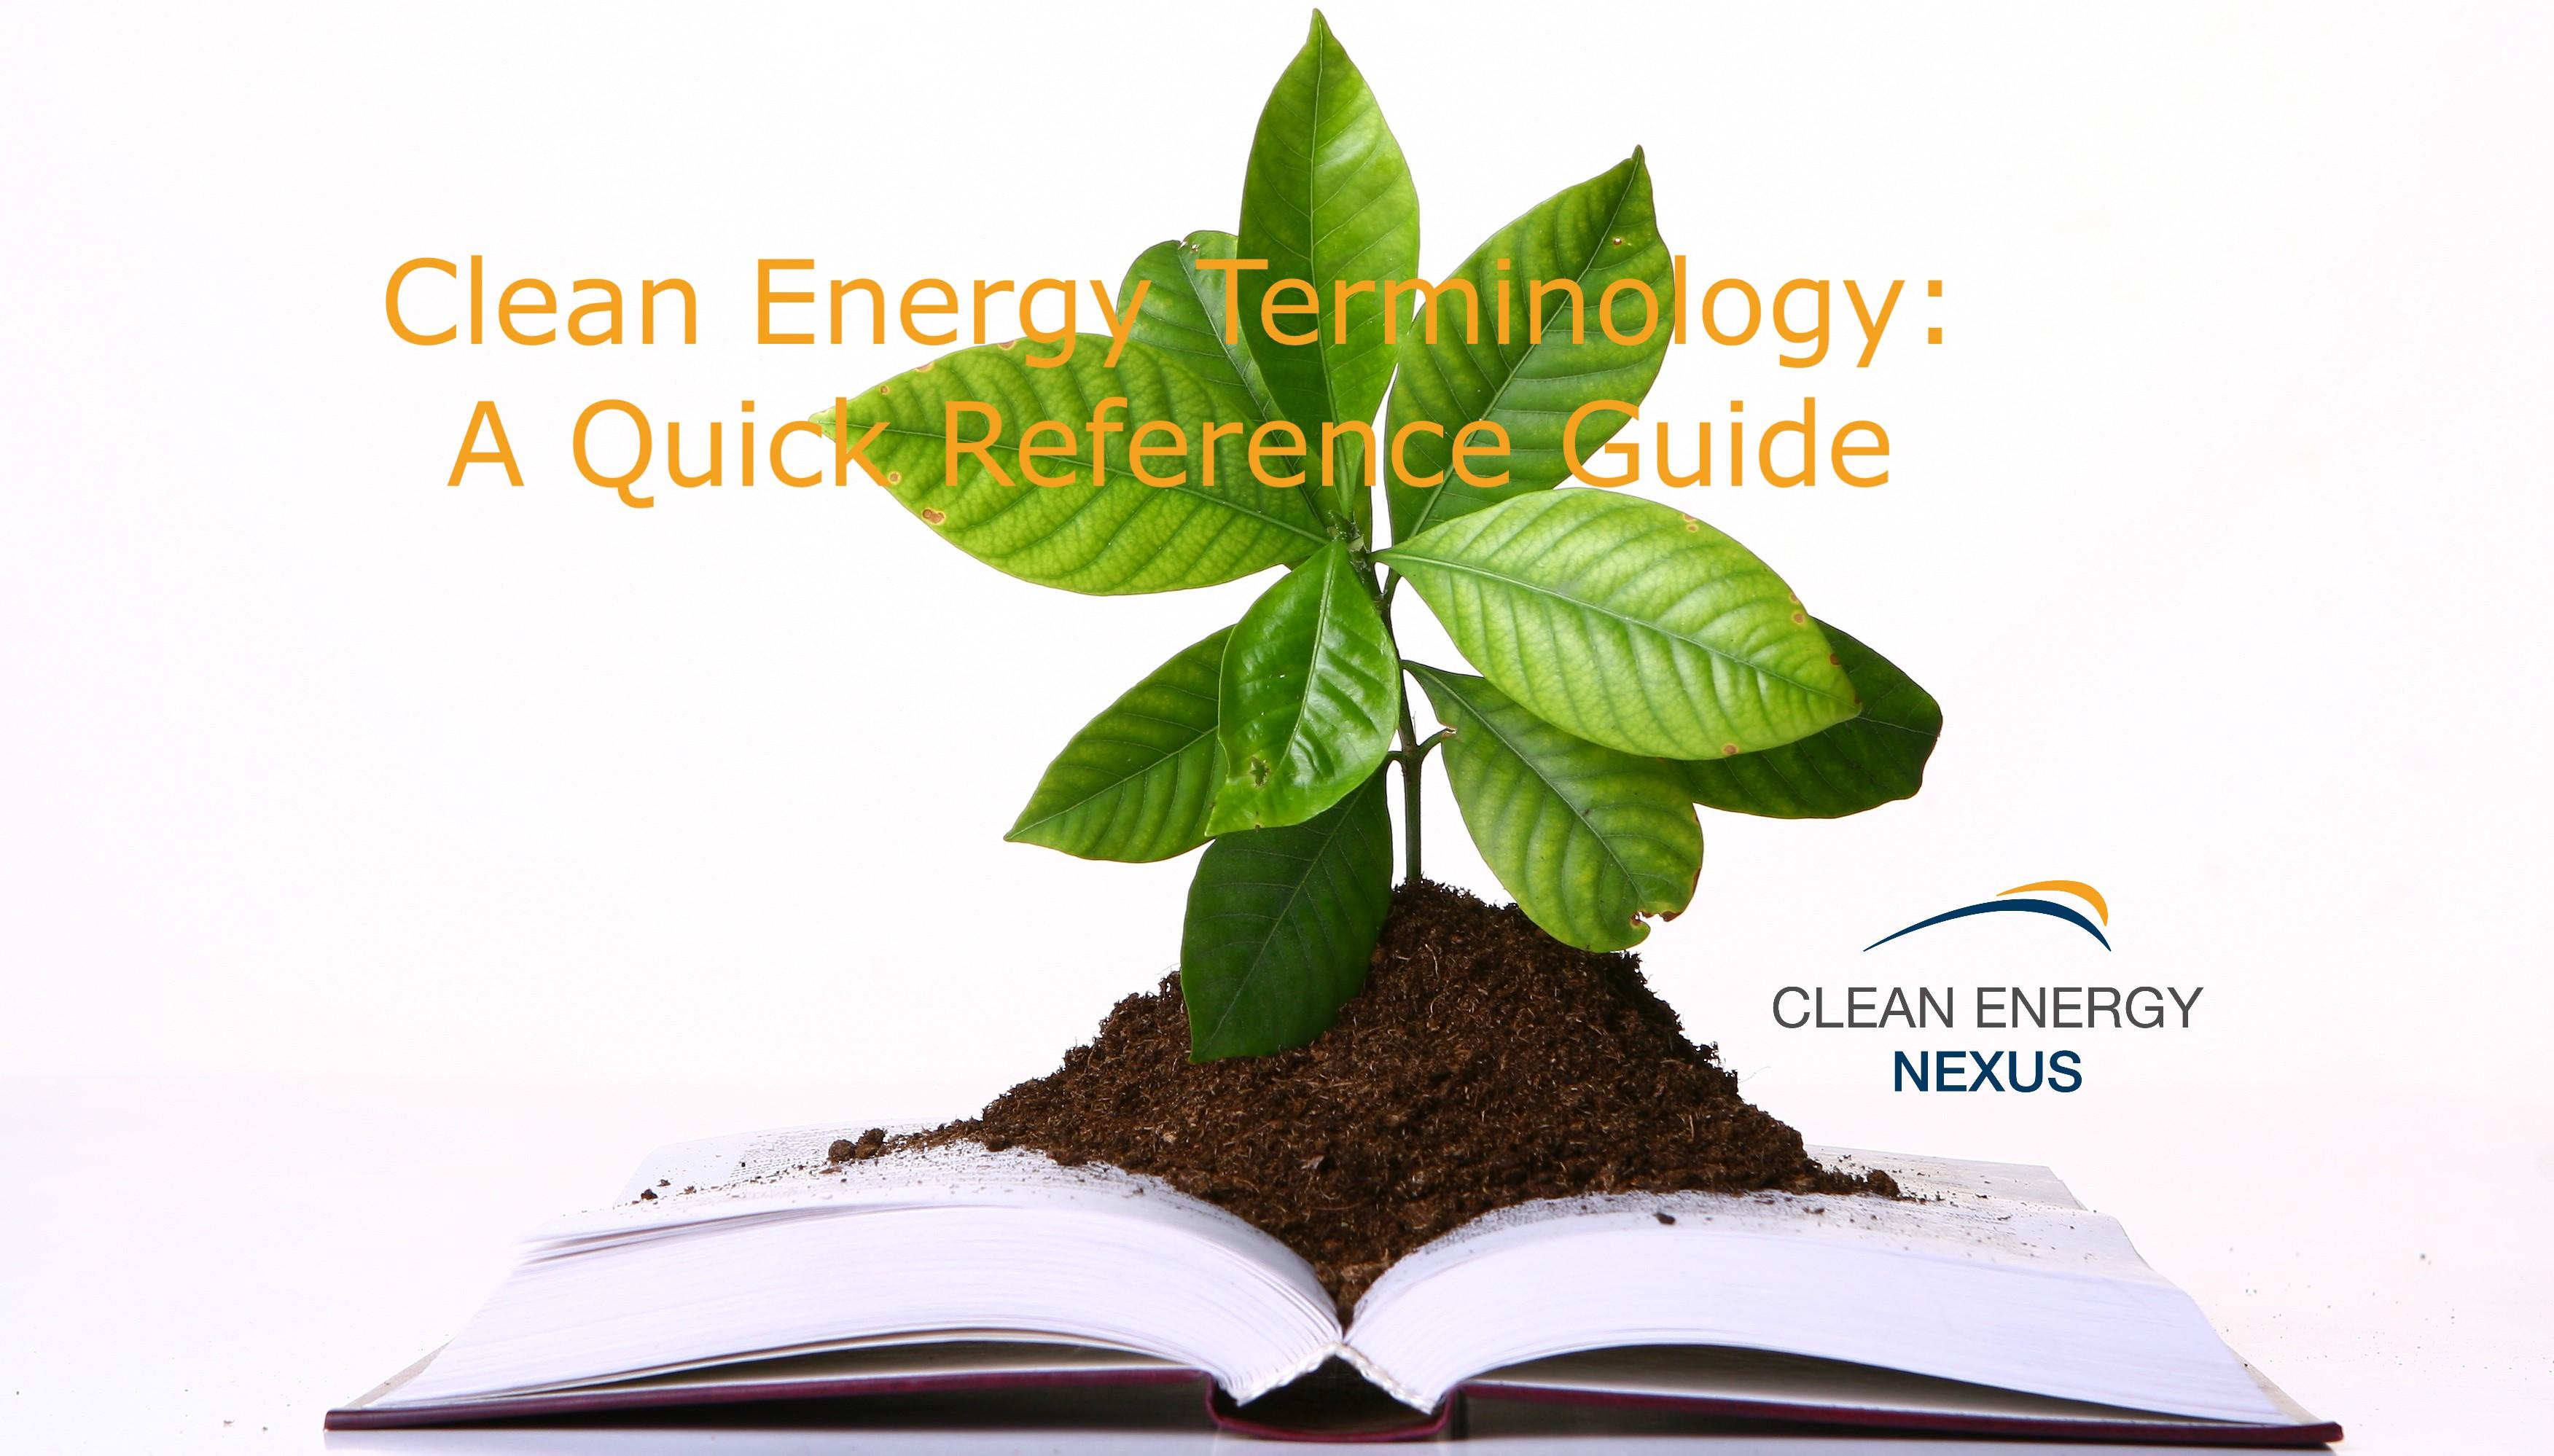 Clean Energy Terminology V1